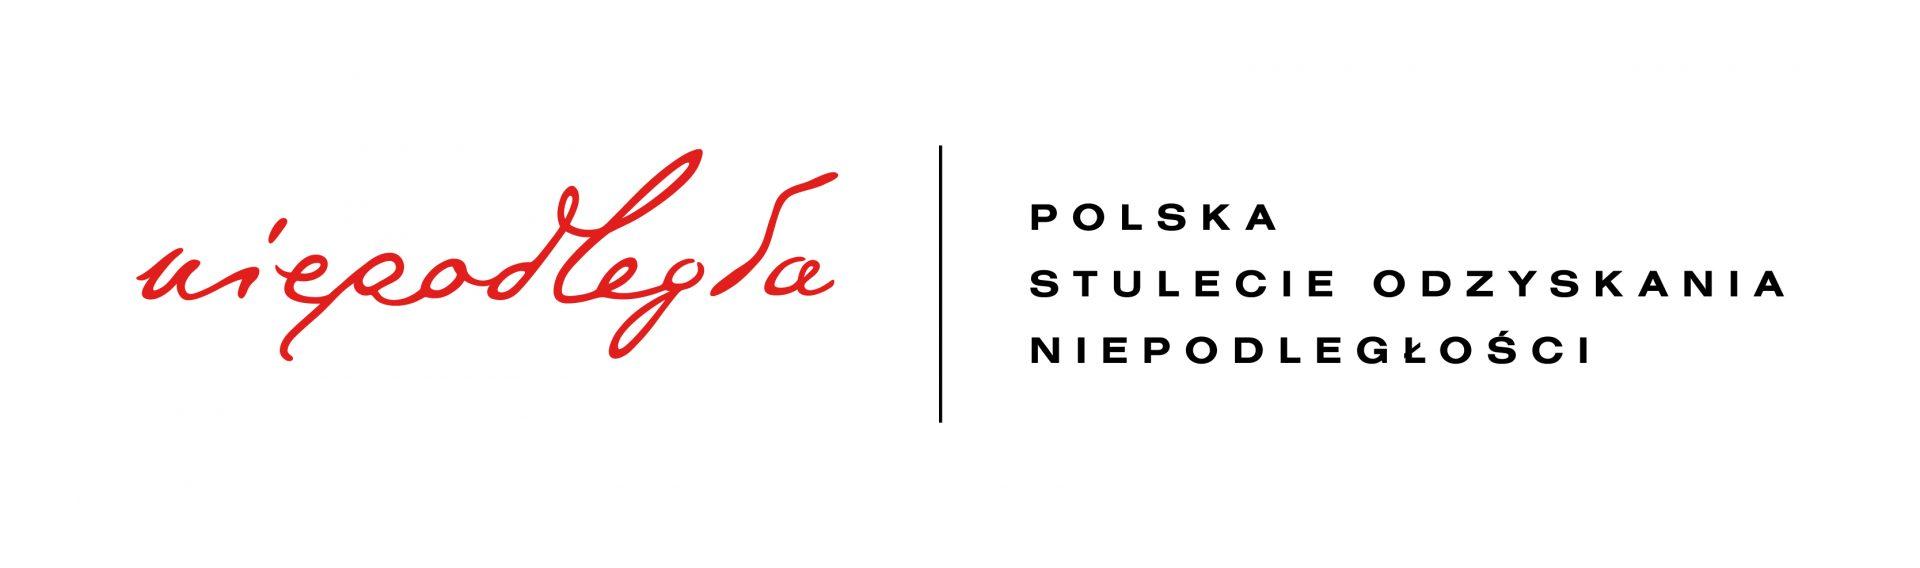 "Warsaw Security Forum 2018 under the ""Niepodległa"" multi-year programme banner"